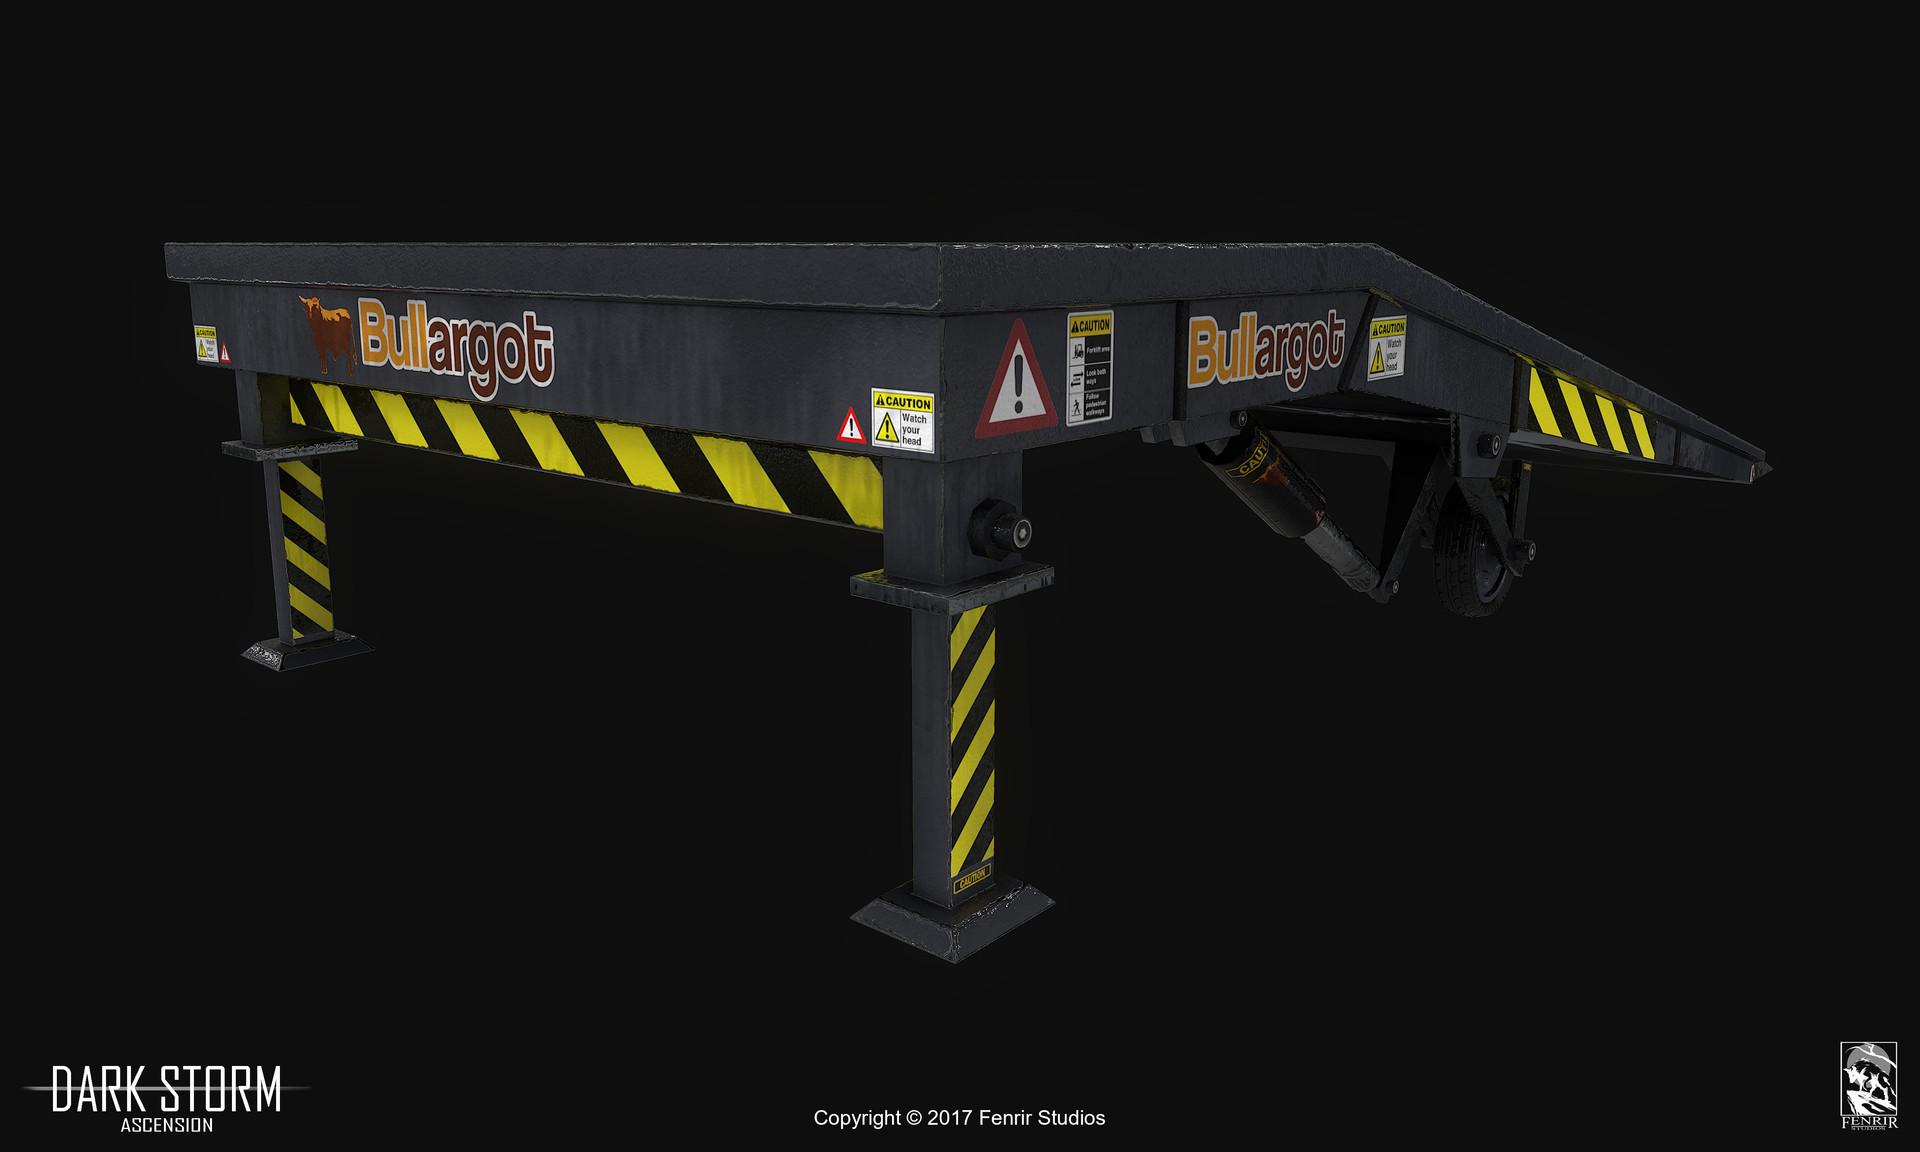 Nikolaos kaltsogiannis cargo ramp presentation 01